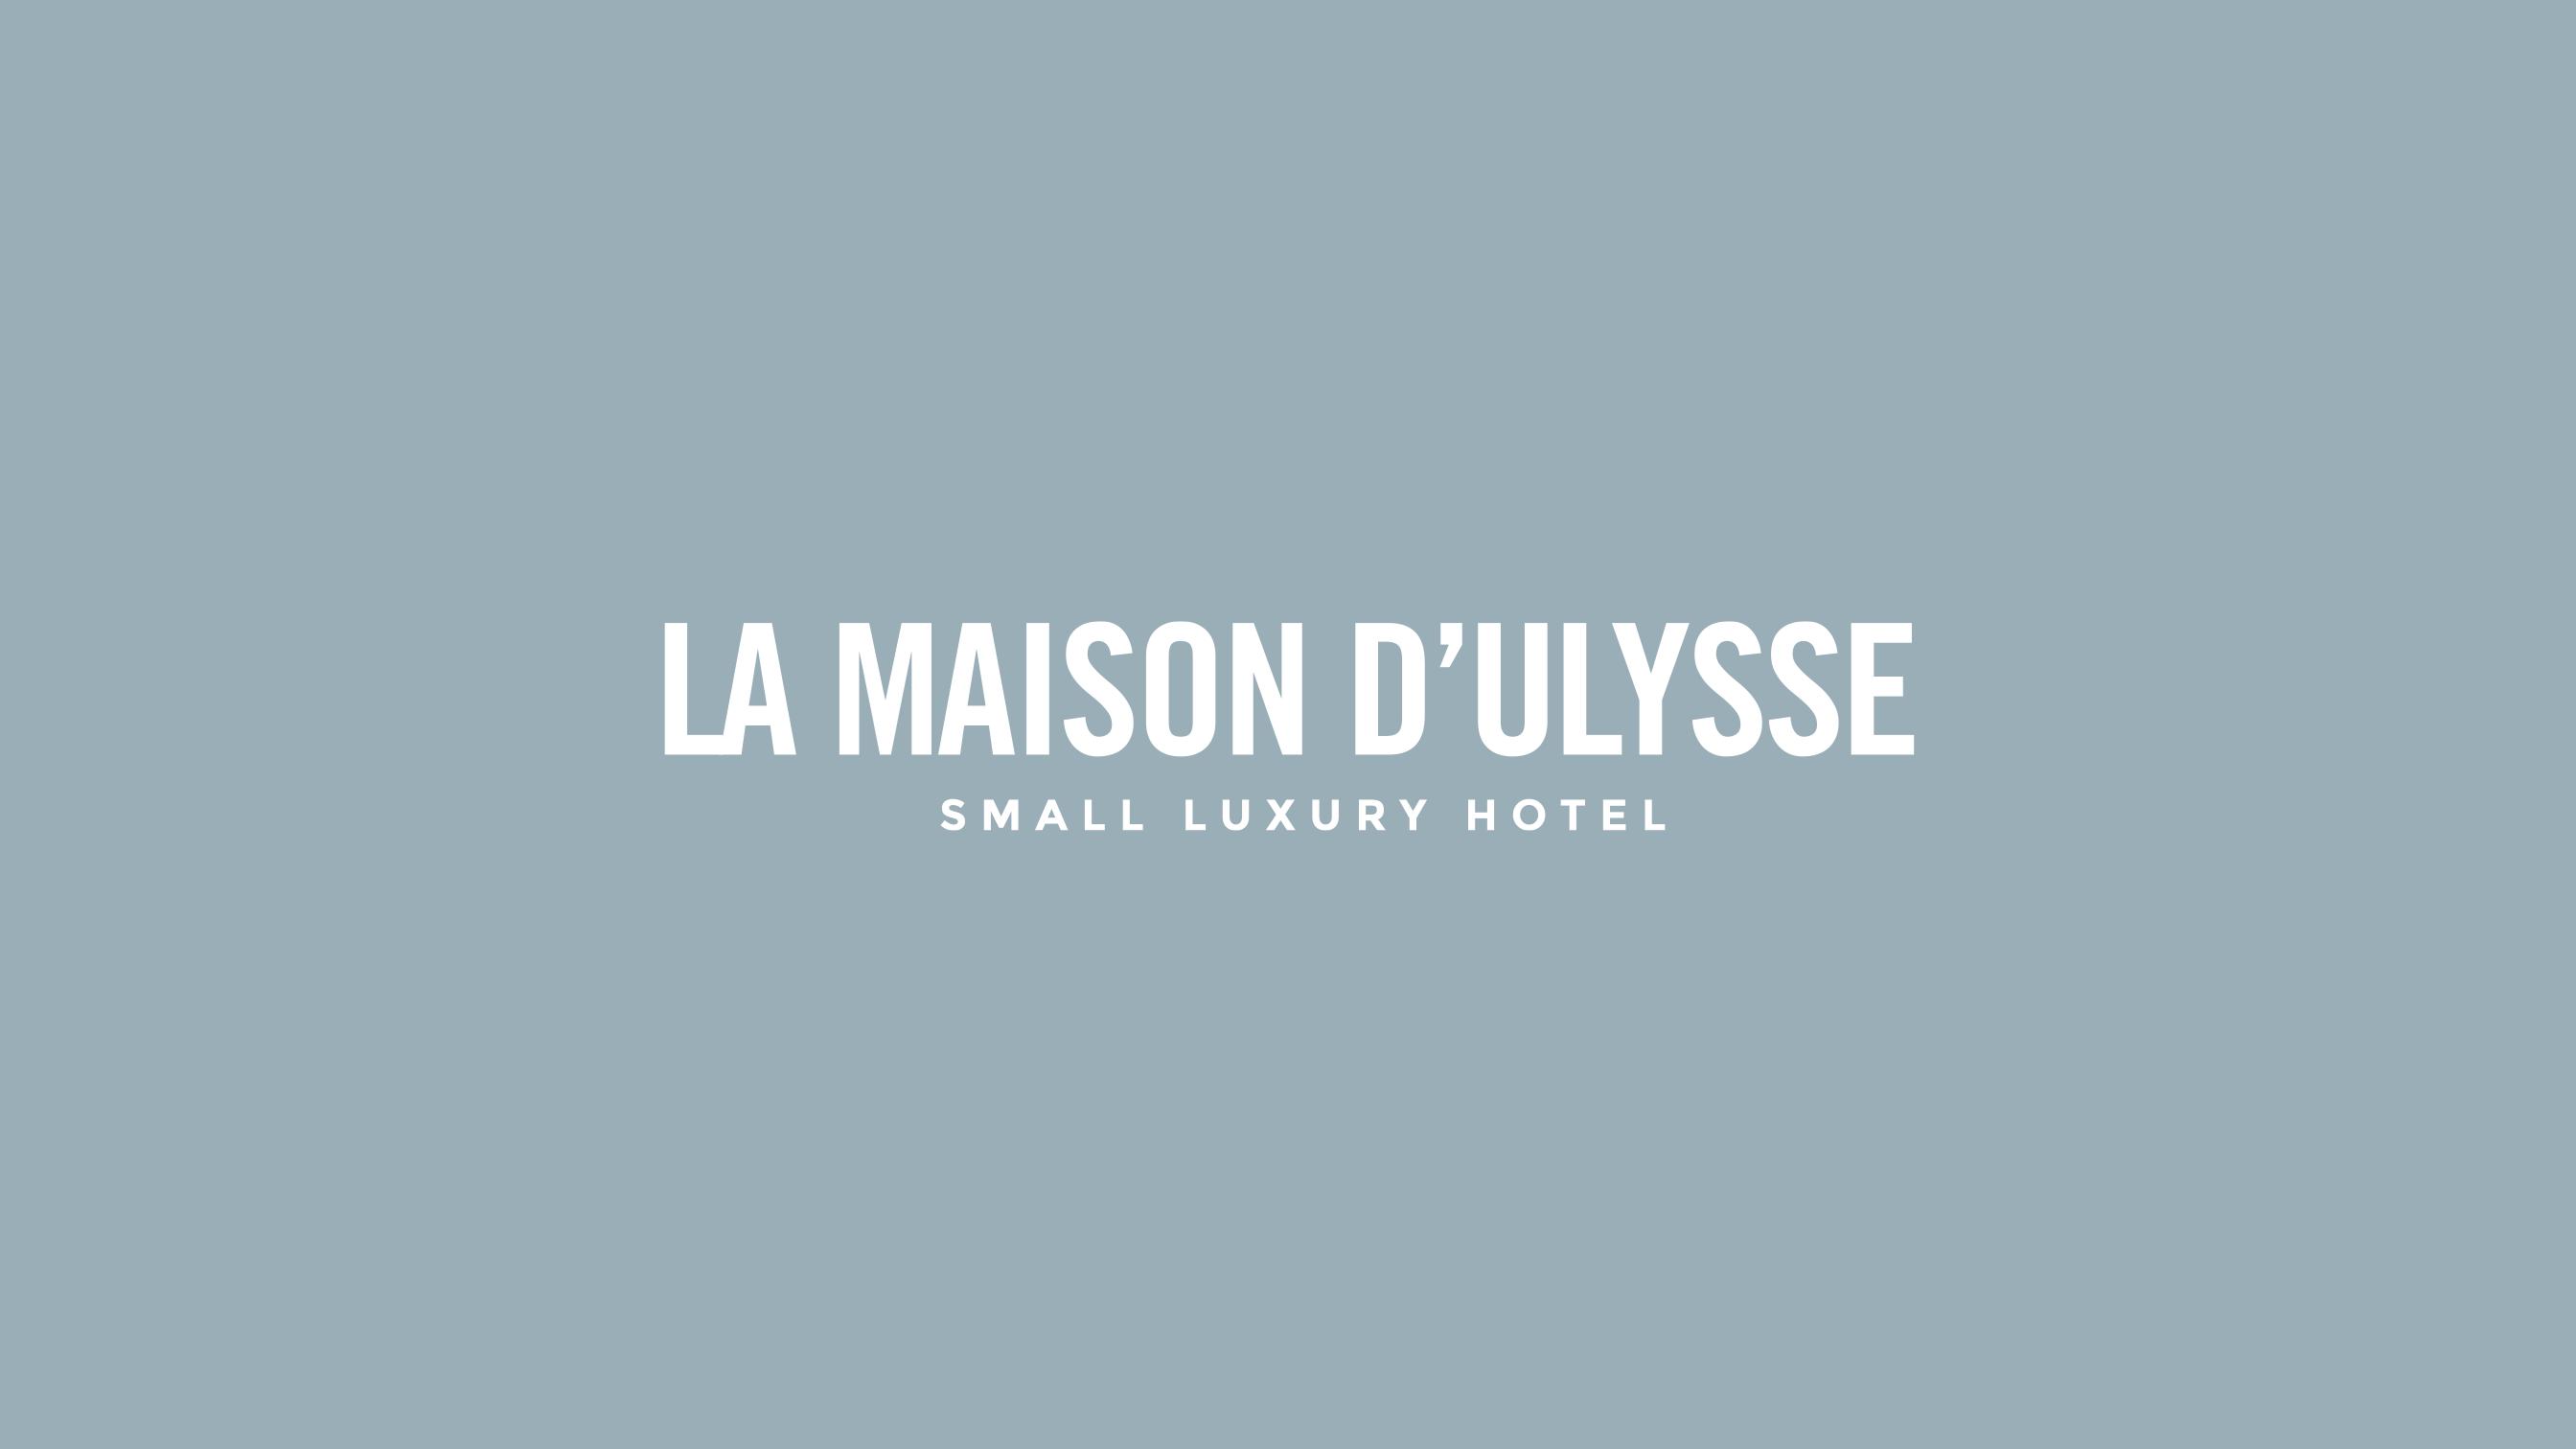 la-maison-d-ulysse-logotype